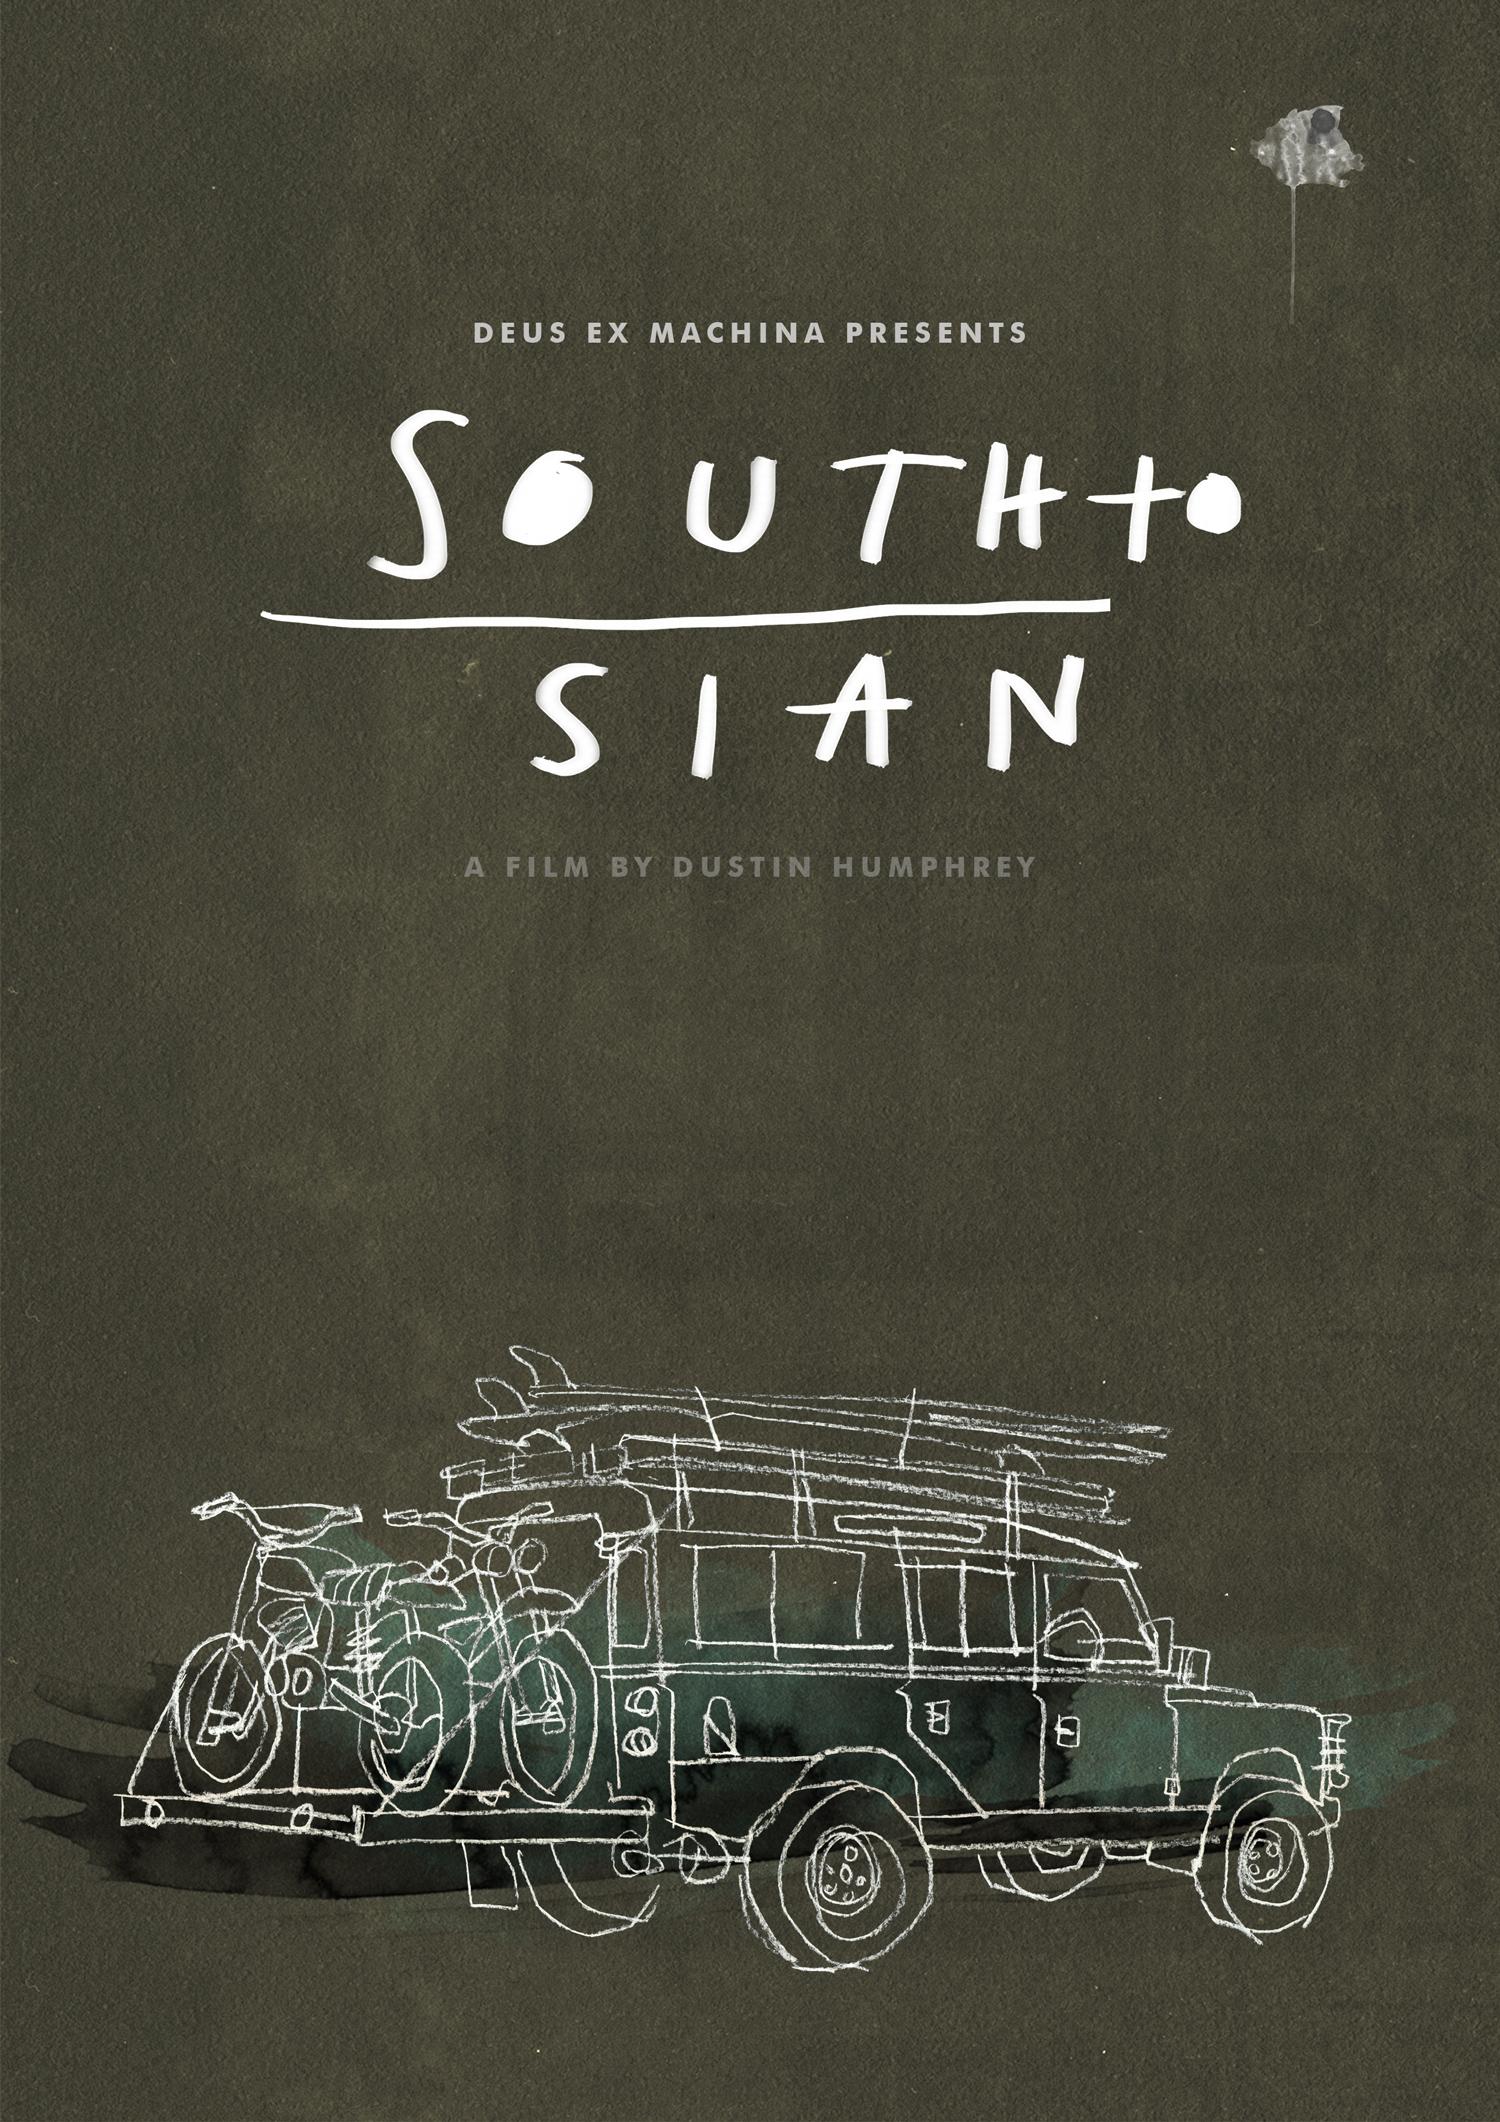 South To Sian Movie Premiere Deus Ex Machinadeus Ex